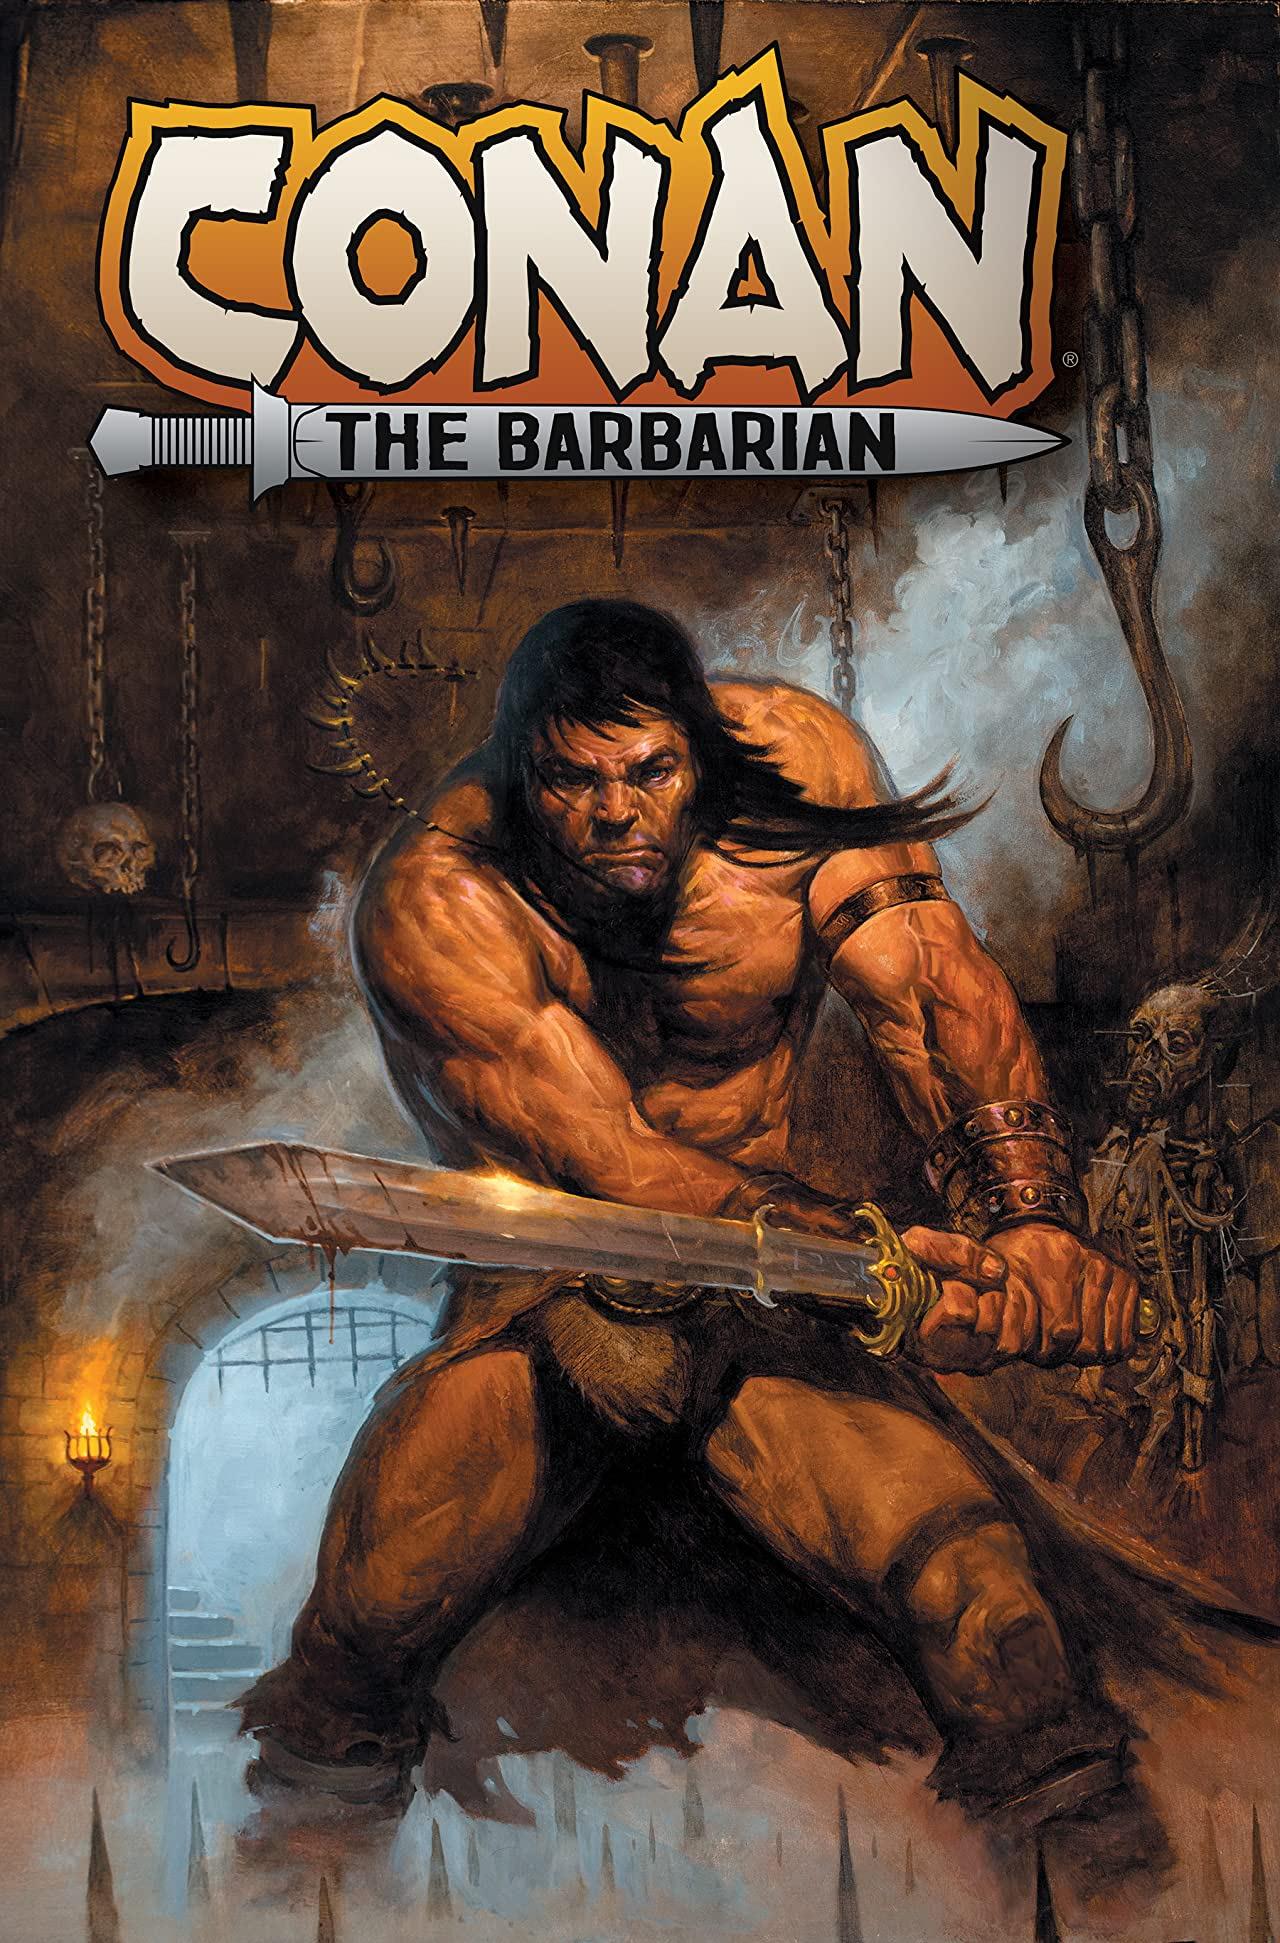 Conan The Barbarian by Jim Zub Vol. 1: Into The Crucible (Trade Paperback)